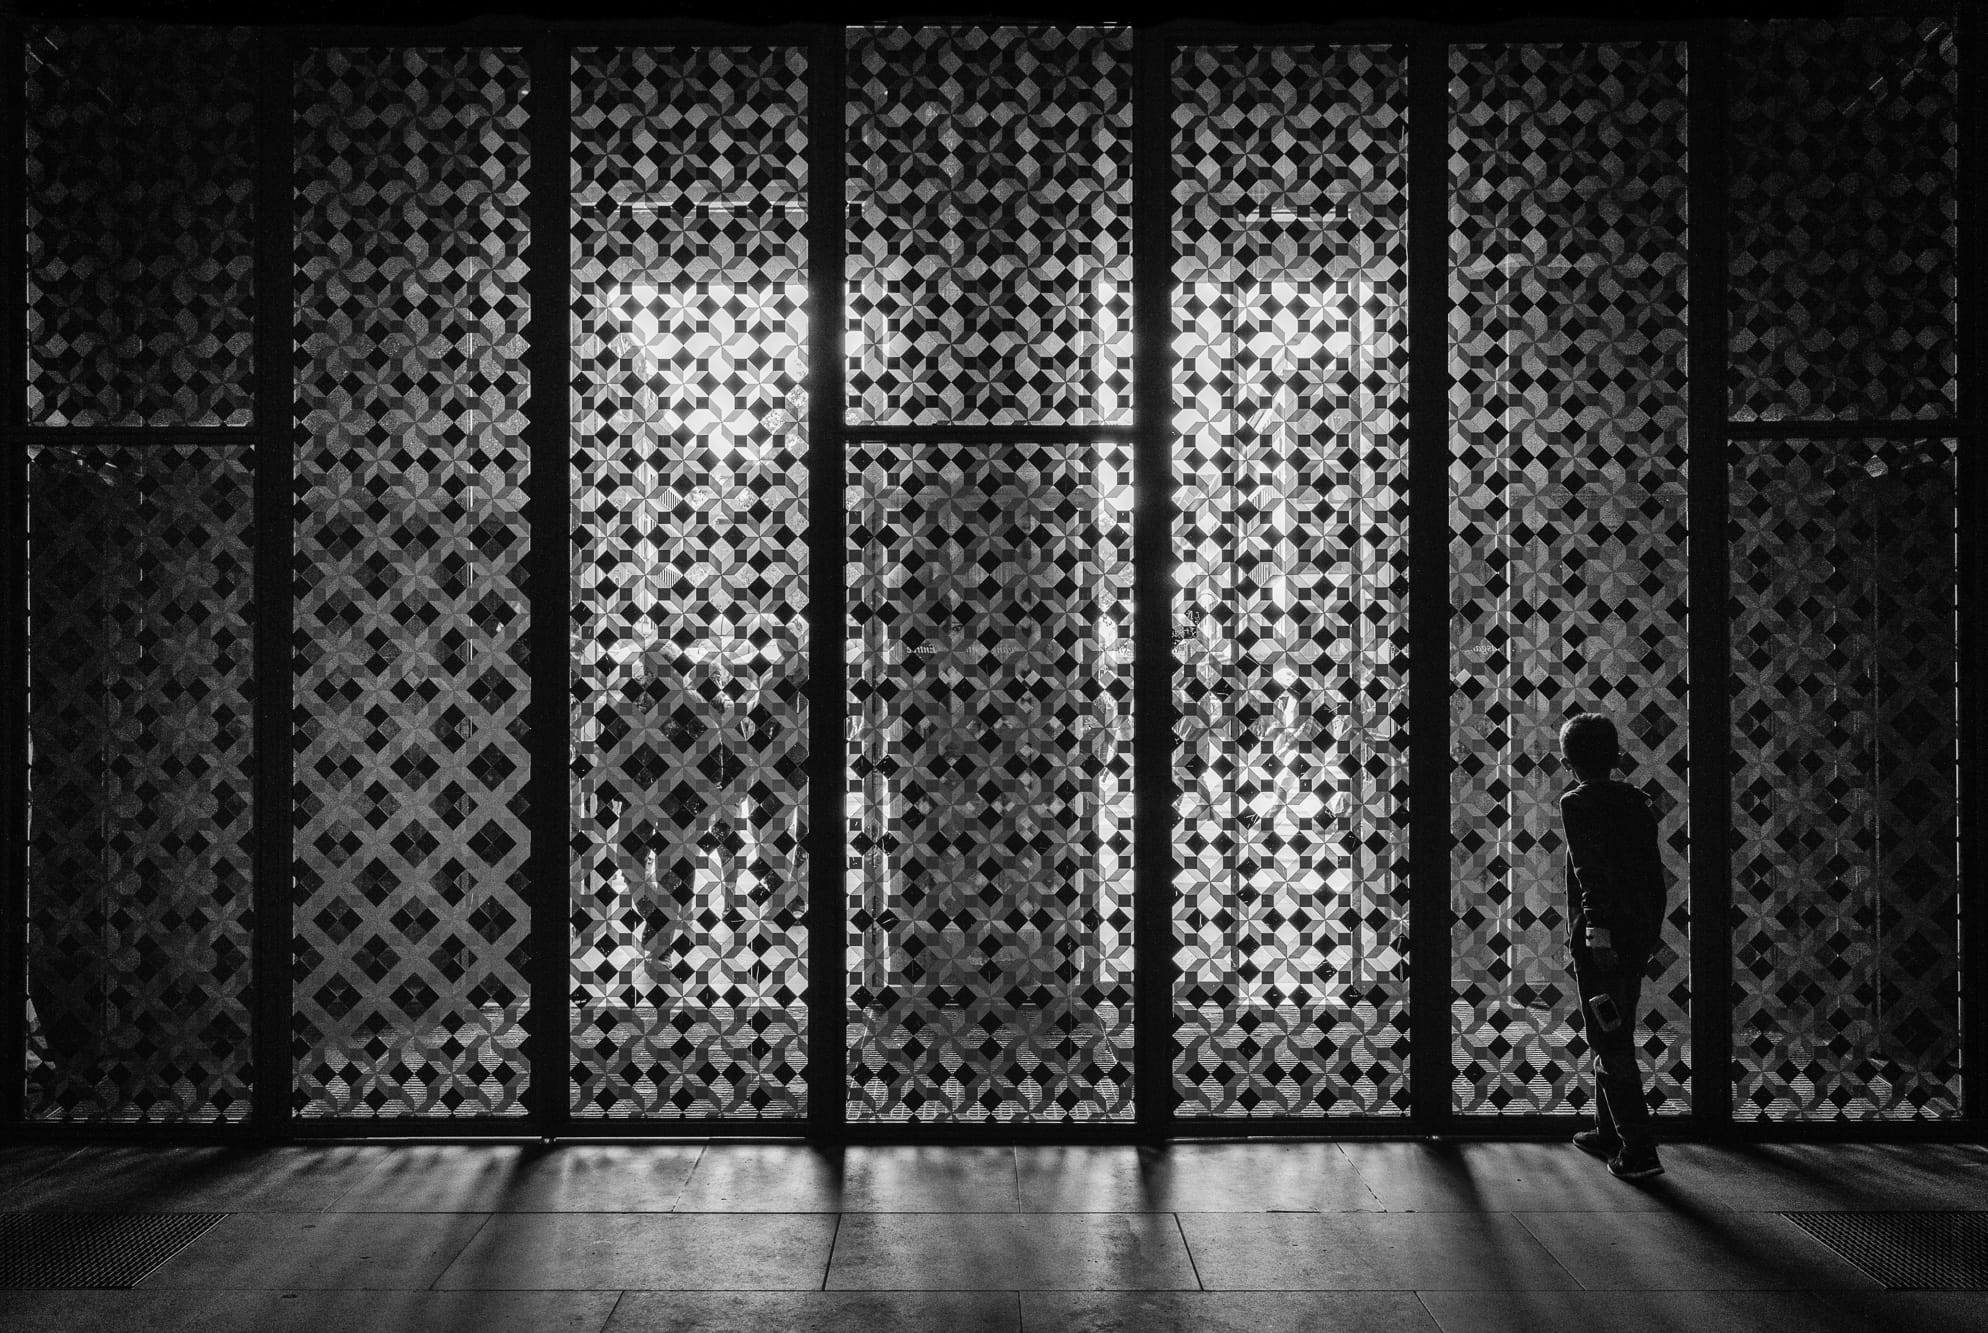 querformat-fotografie - Achim Katzberg - [untitled - Köln / Oktober 2017]